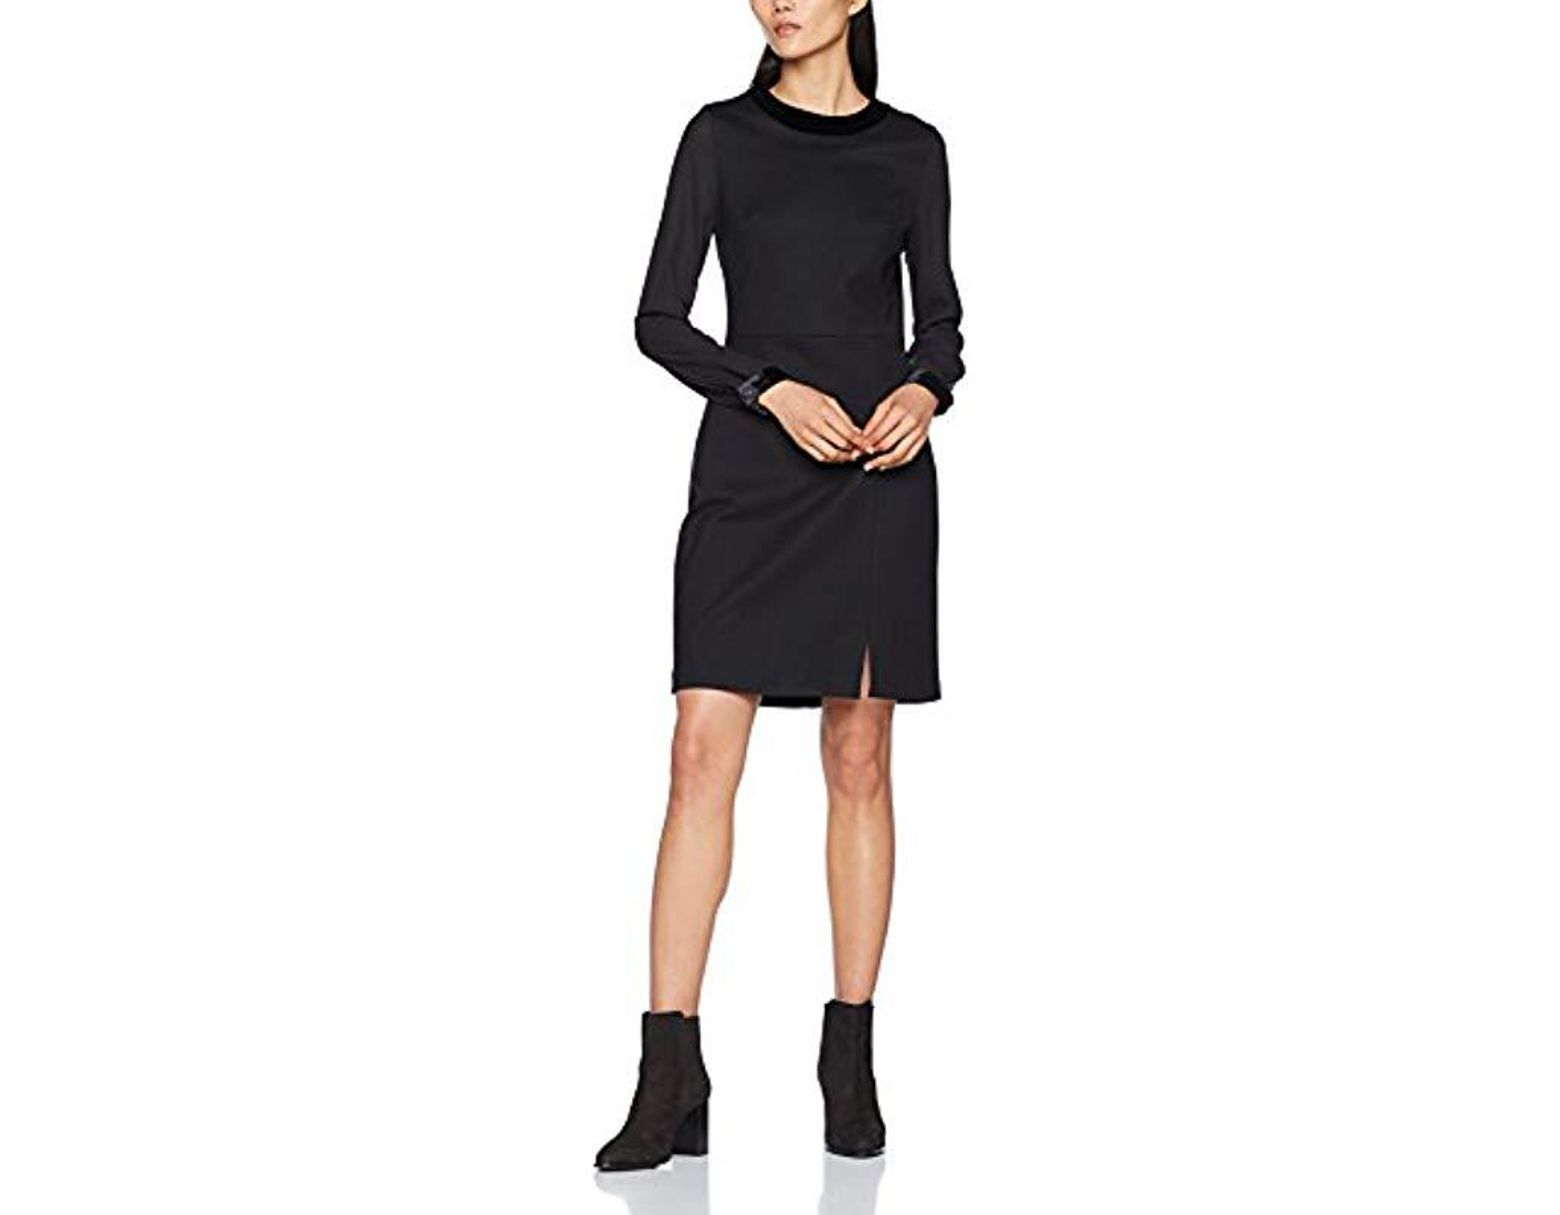 Femme Robe Dress Ls De Nerissa Noir Coloris 2EDIH9